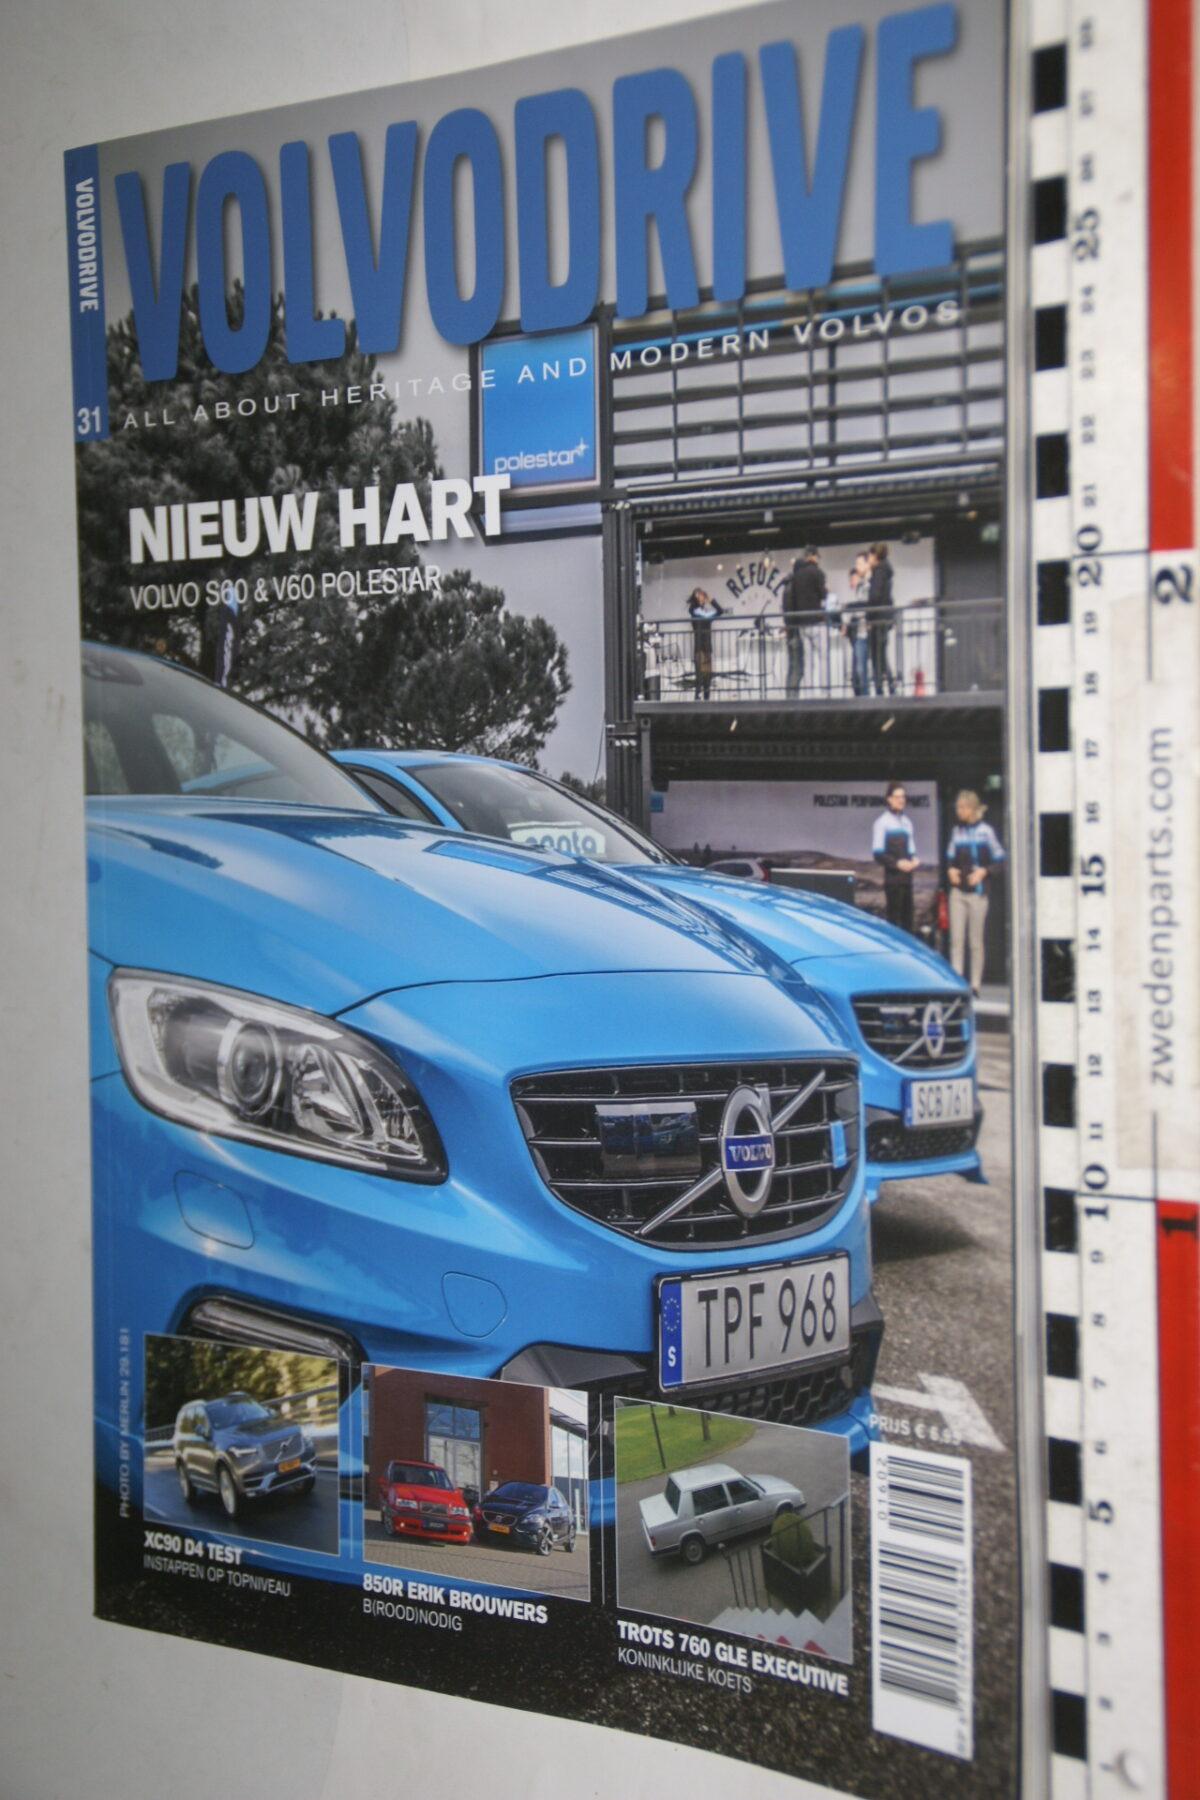 DSC00319 tijdschrift Volvodrive nr 31 met Polestar-1fed8a3a